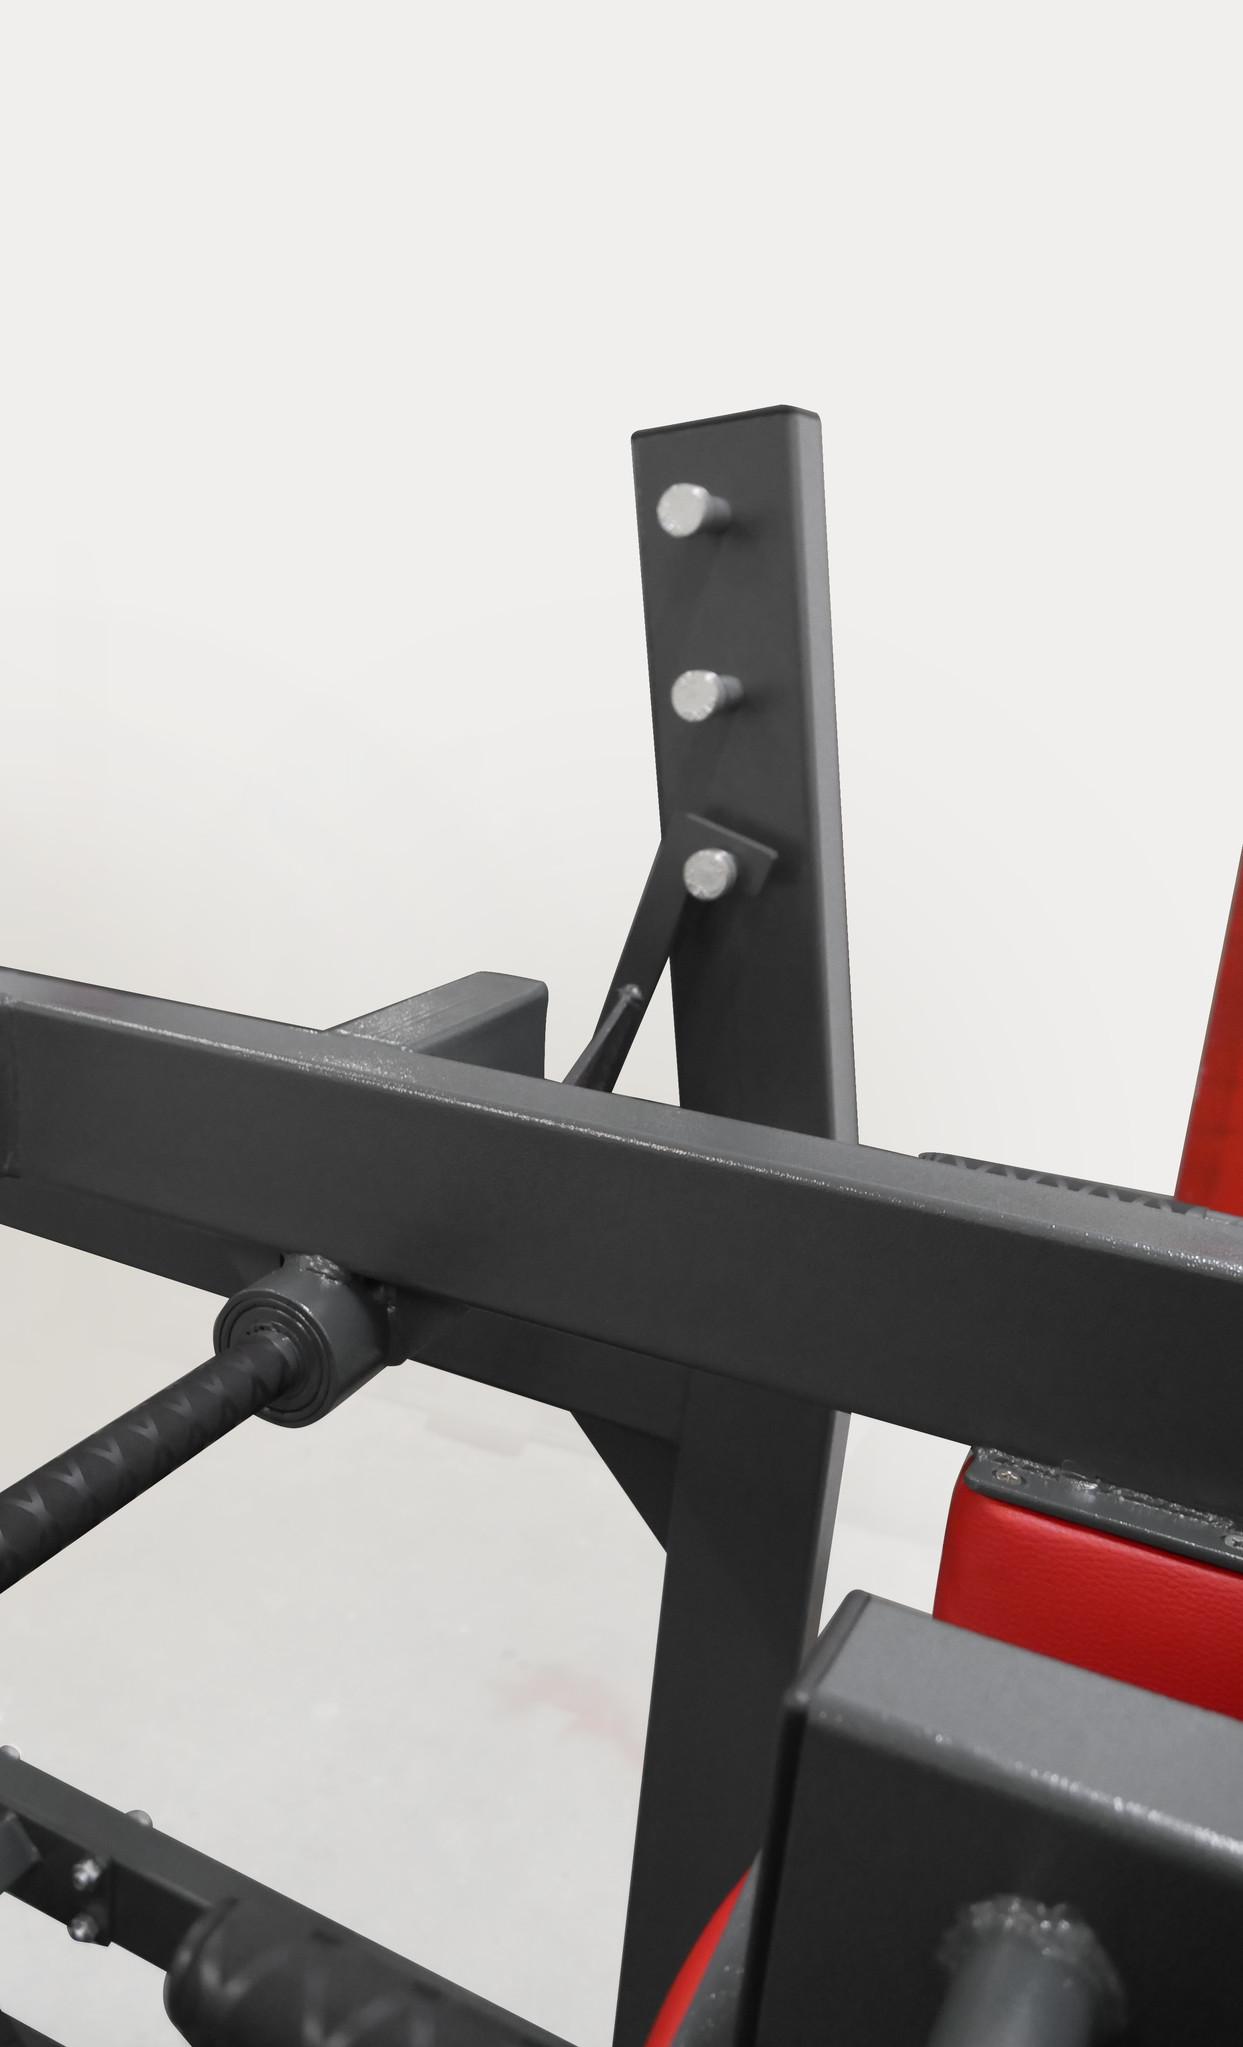 Pendulum squat (3RX)  with adjustable platform